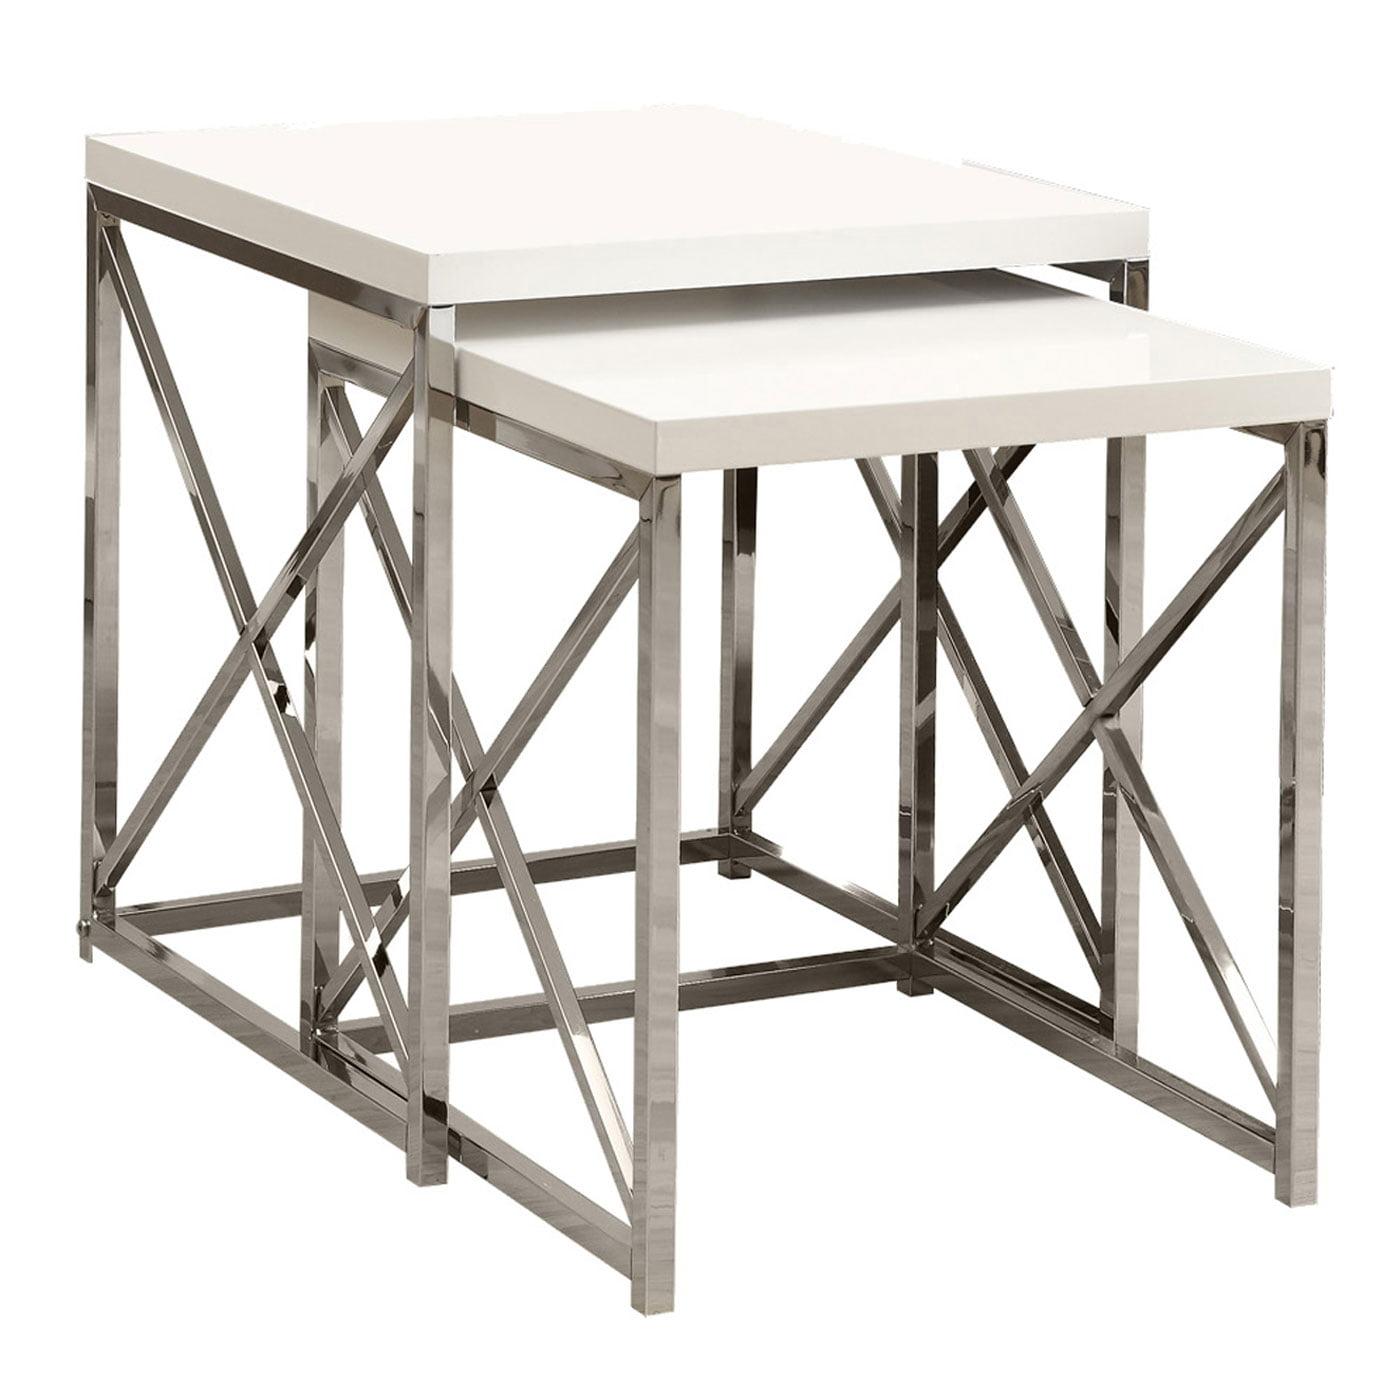 Monarch Nesting Table 2Pcs Set / Glossy White / Chrome Metal